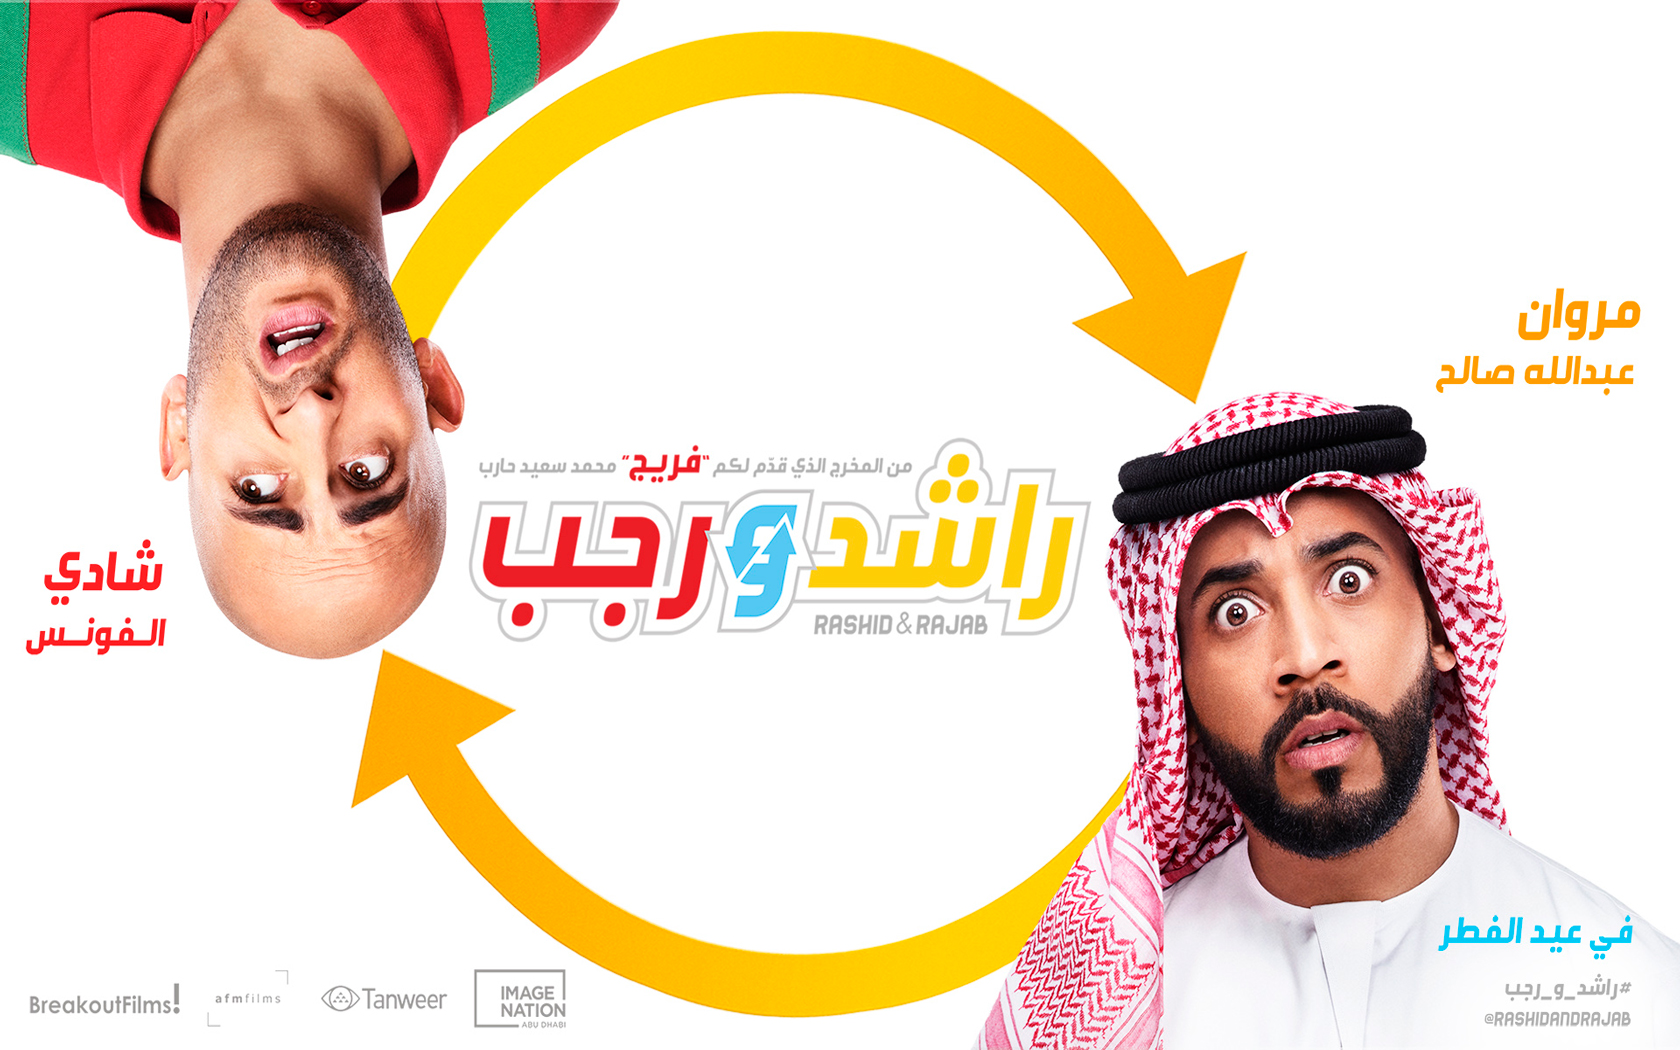 Tanweer - Rashid & Rajab / راشد و رجب